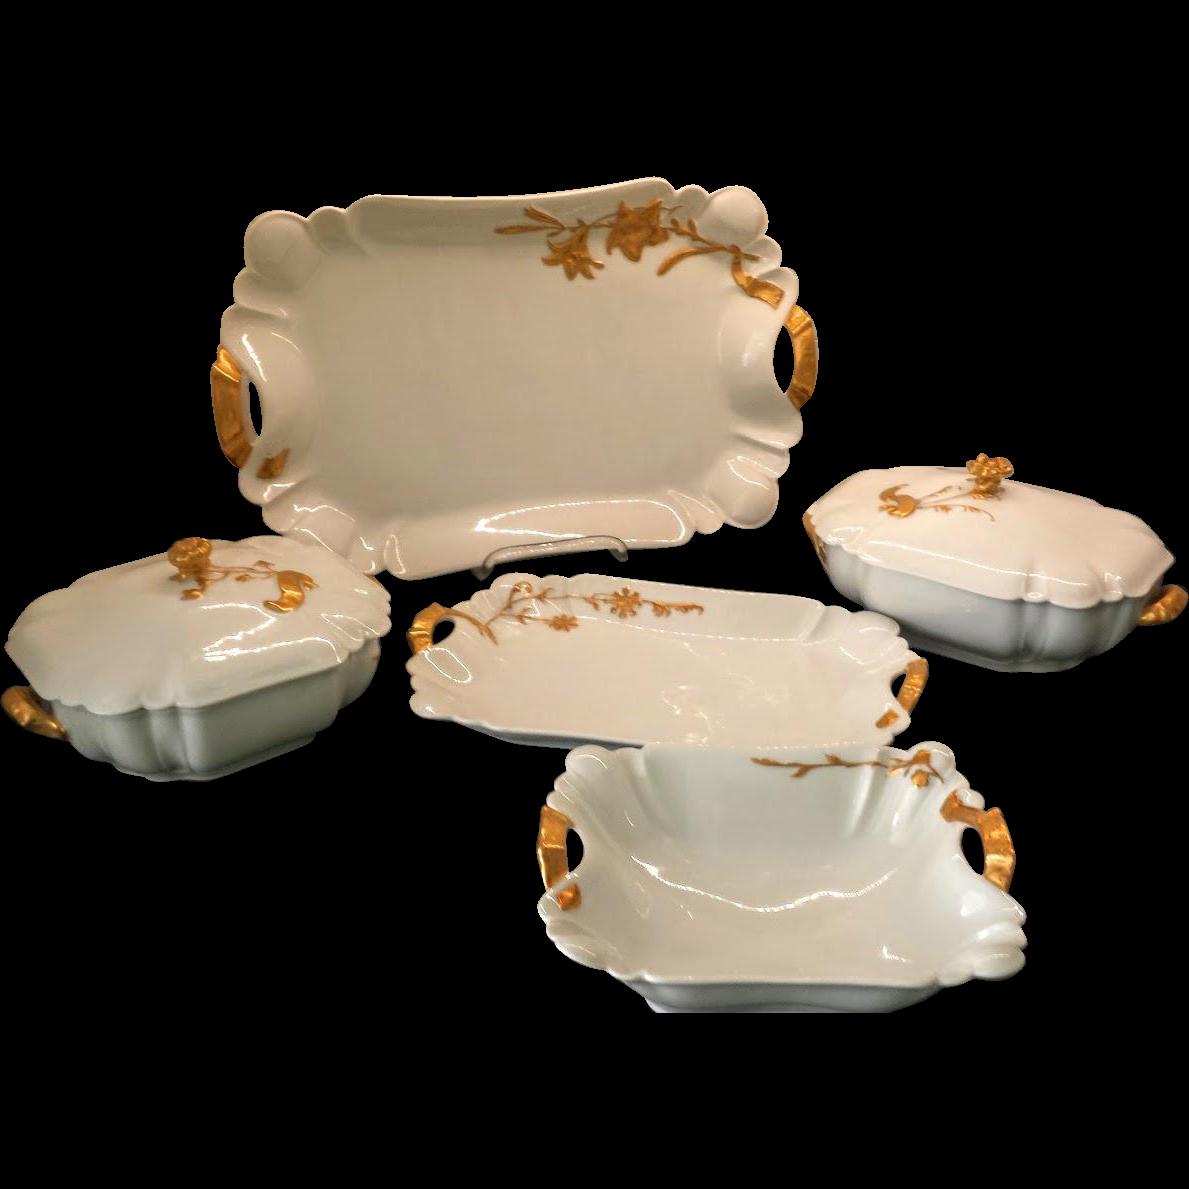 Set Antique Haviland Limoges Schleiger #10-1  / Henri II Gold & White China Service Pieces